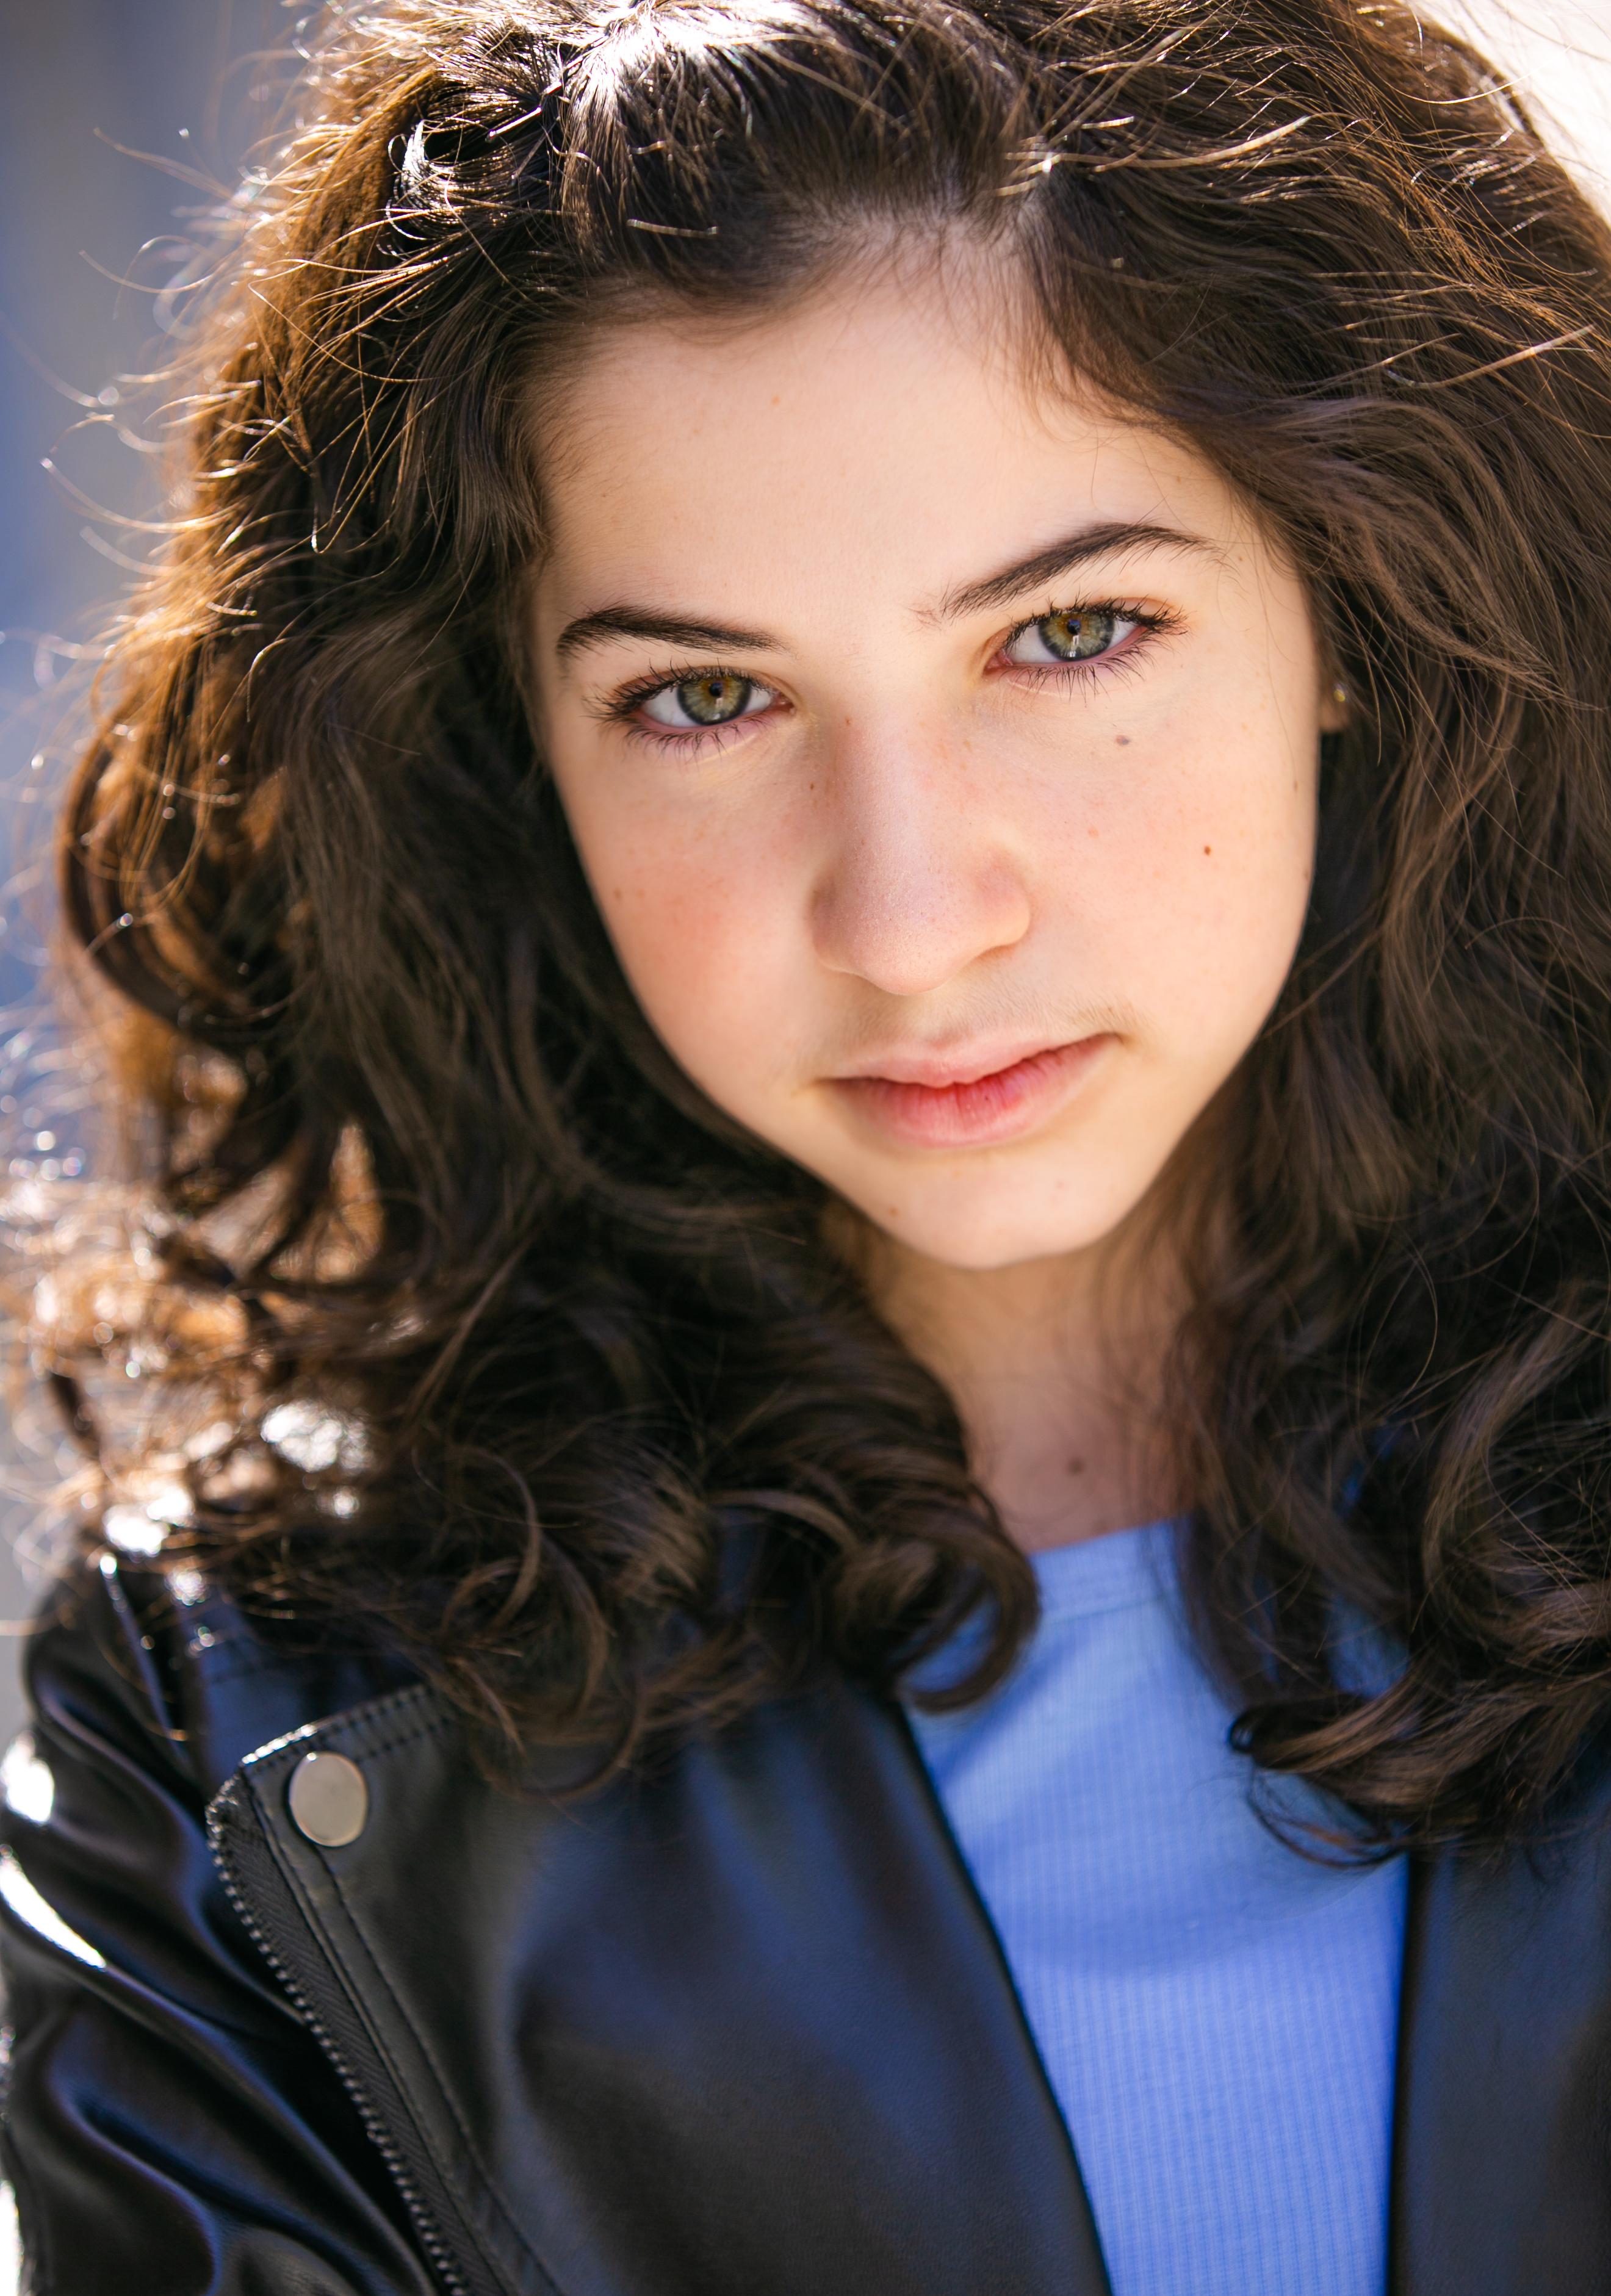 Cassidy Naber